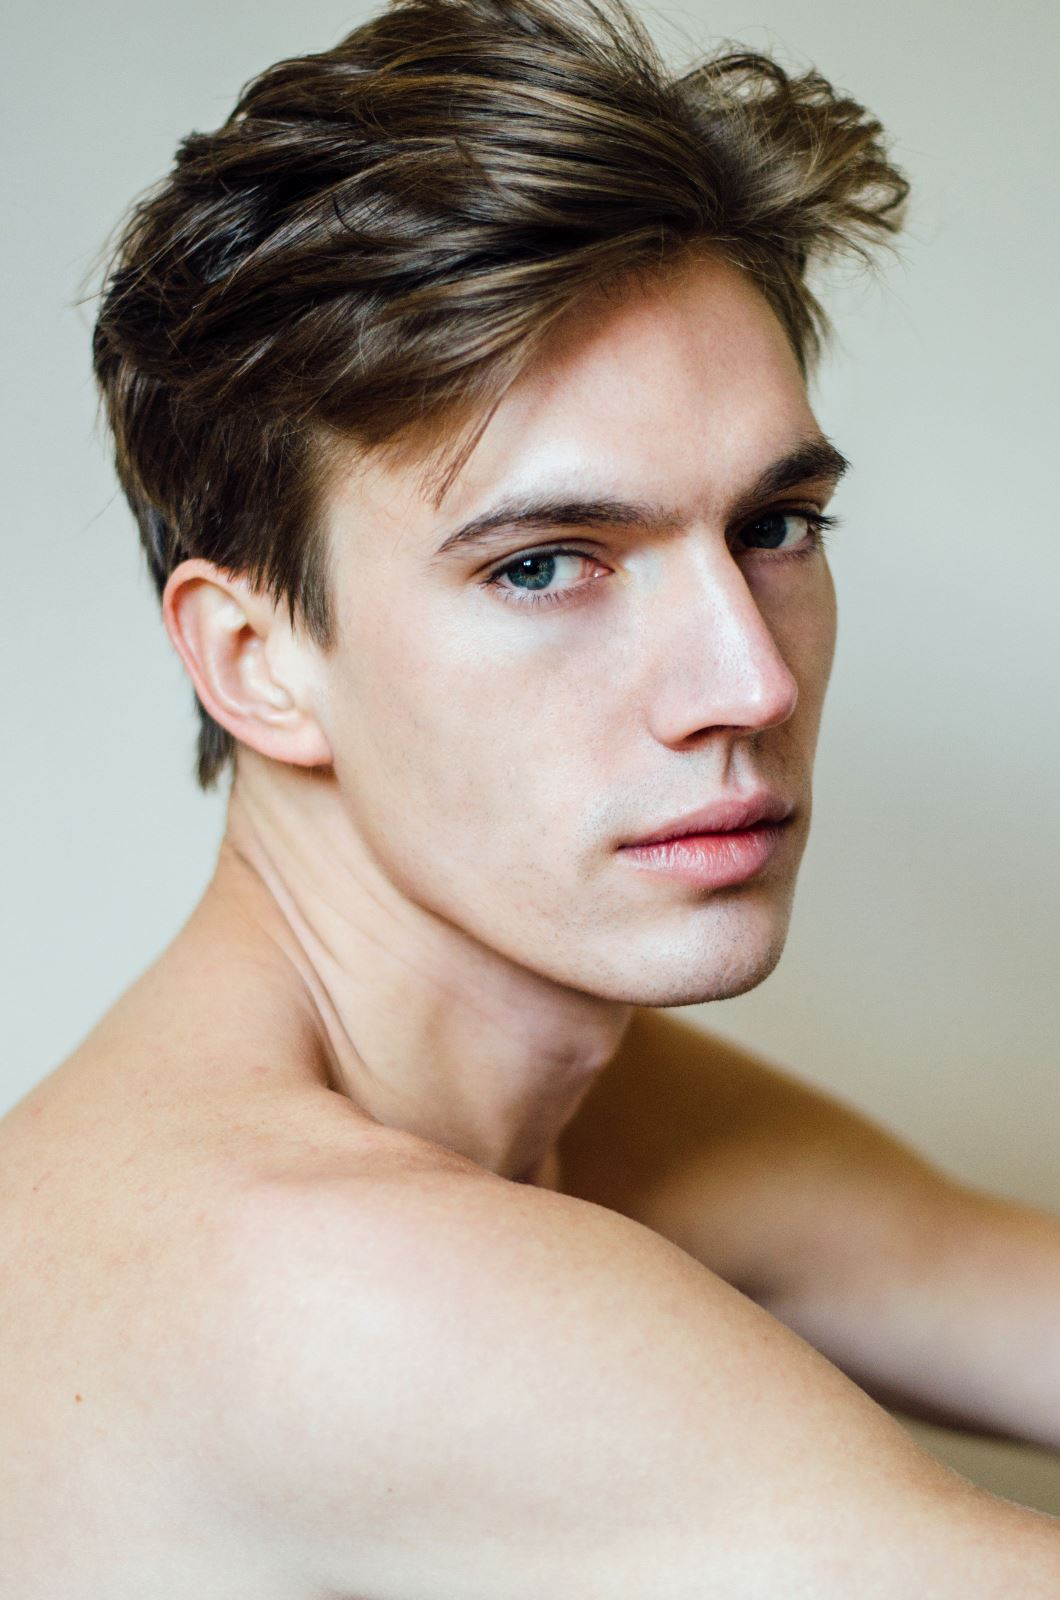 Patrick Braun